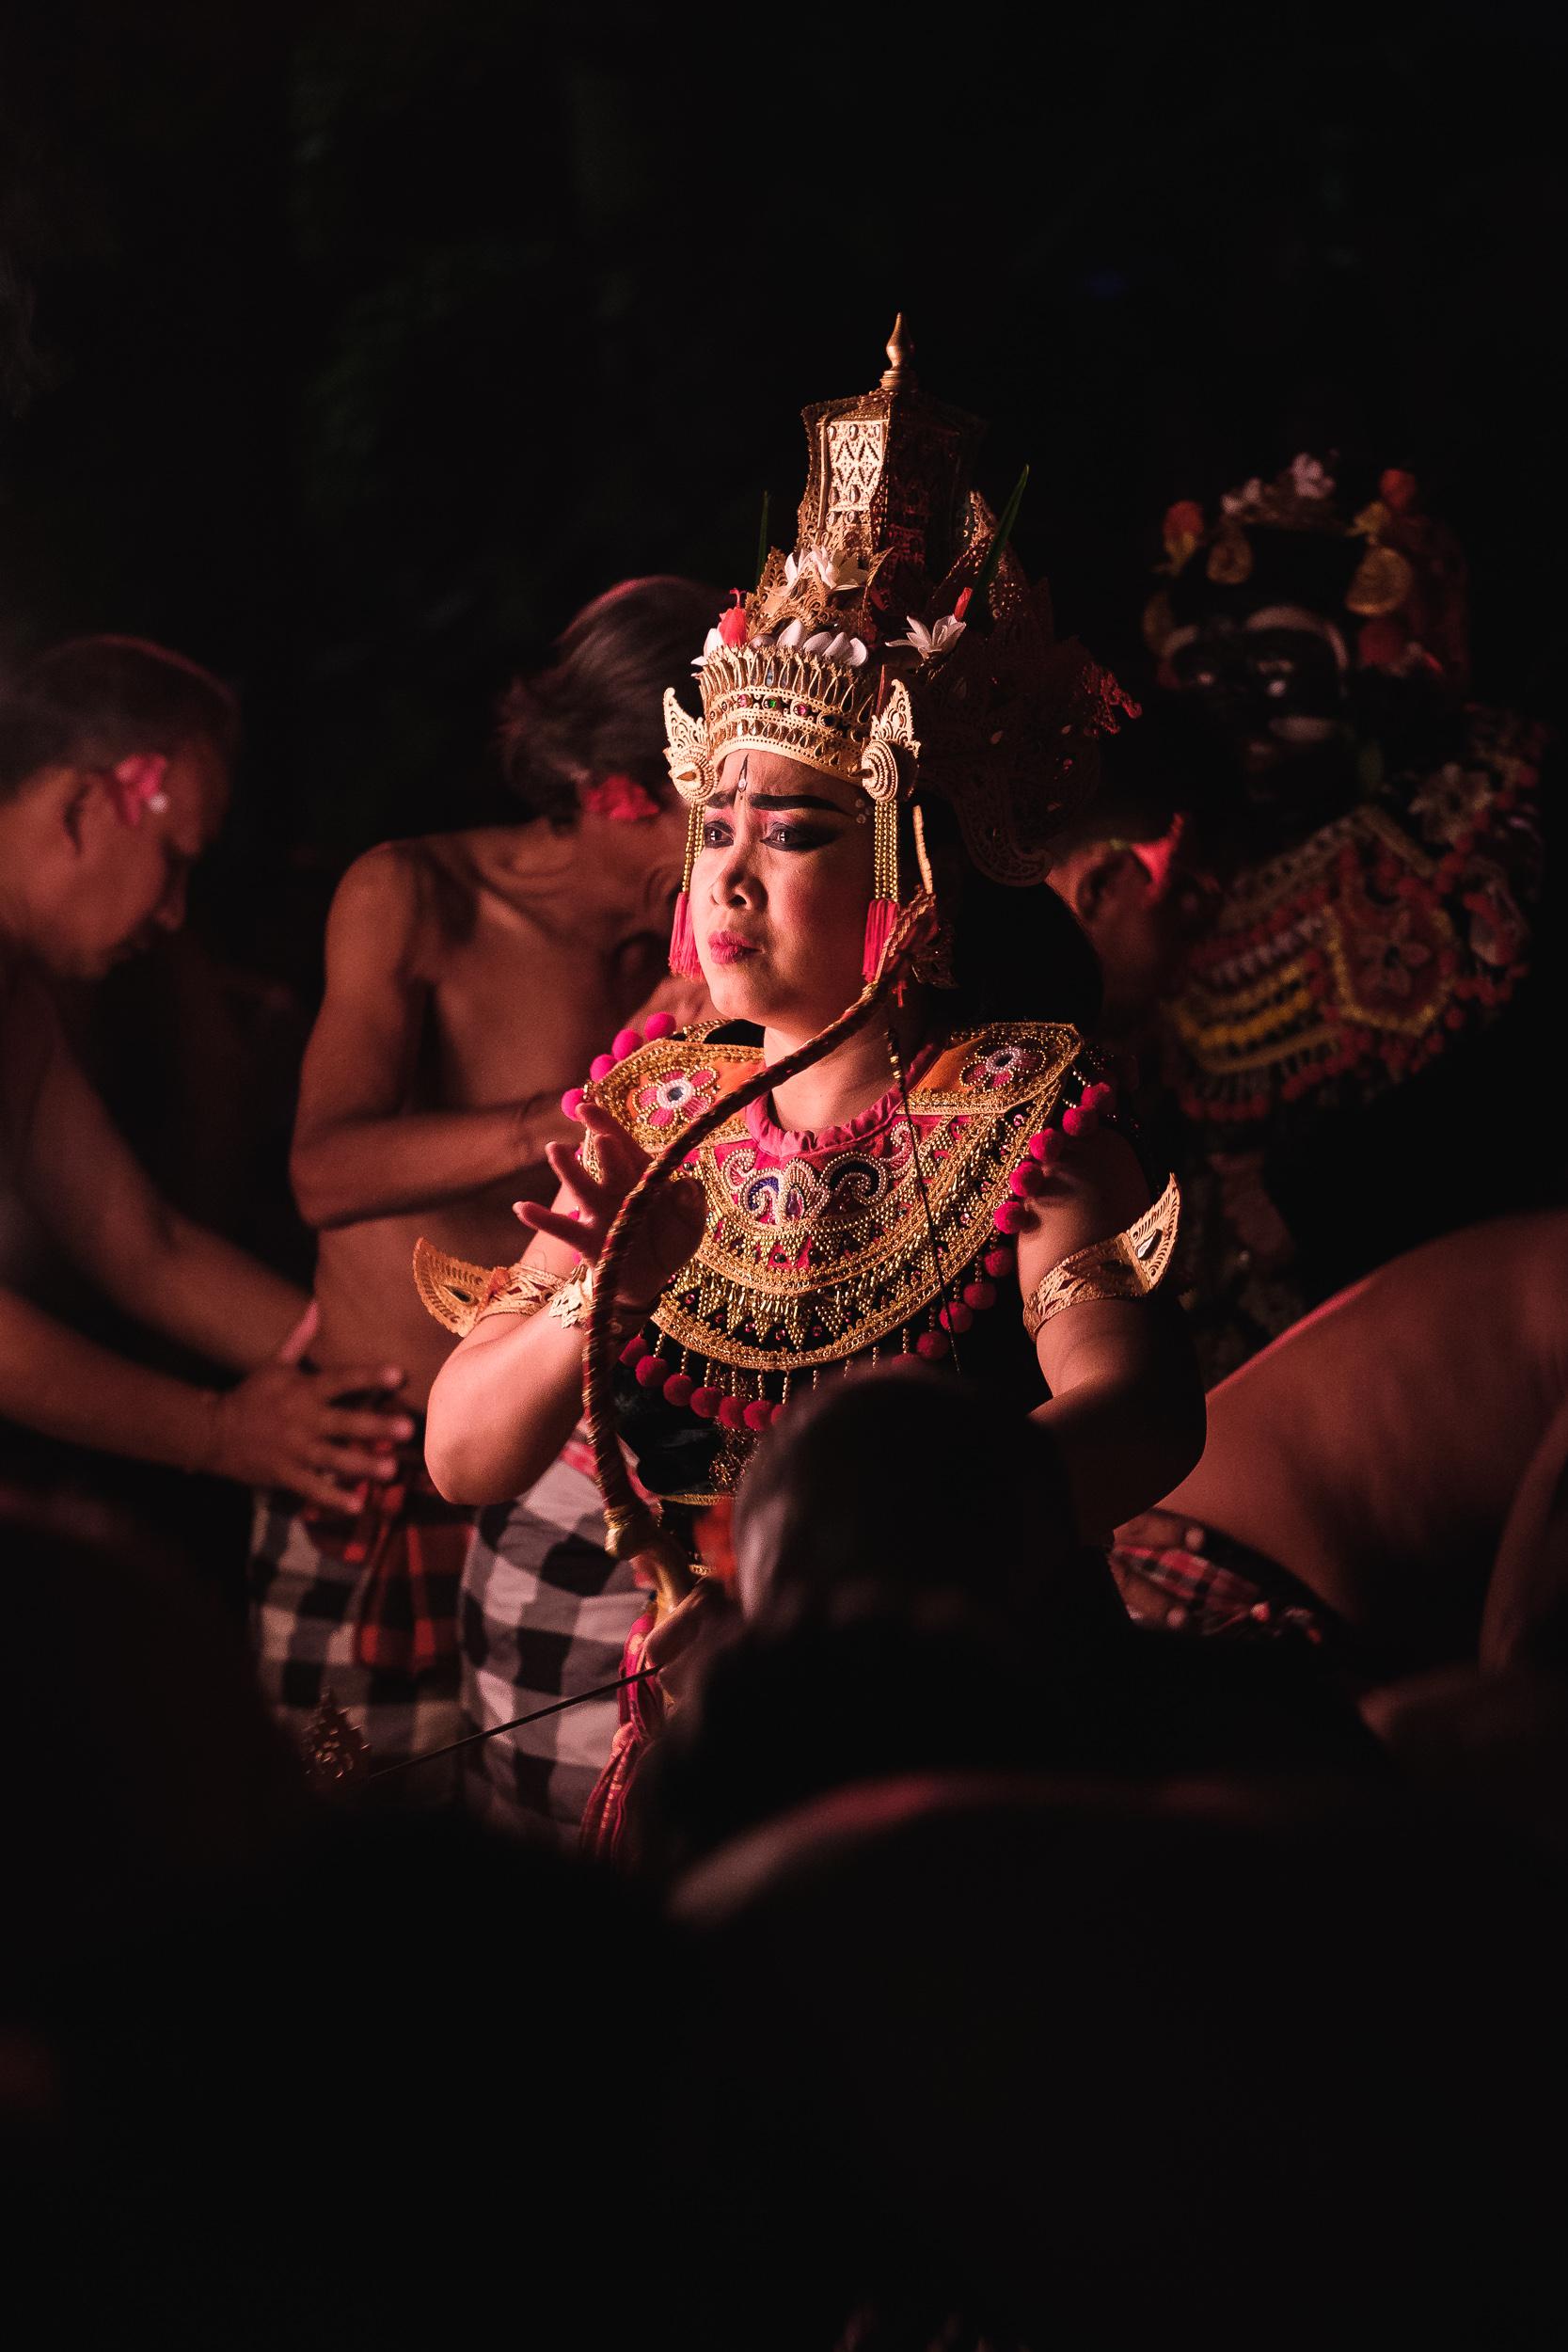 Female Kecak dance performer in Ubud, Bali- Indonesia.  Fujifilm X-E3 + Fujinon XF 80mm f/2.8 R LM WR OIS Macro  1/50sec, f/2.8, ISO 4000